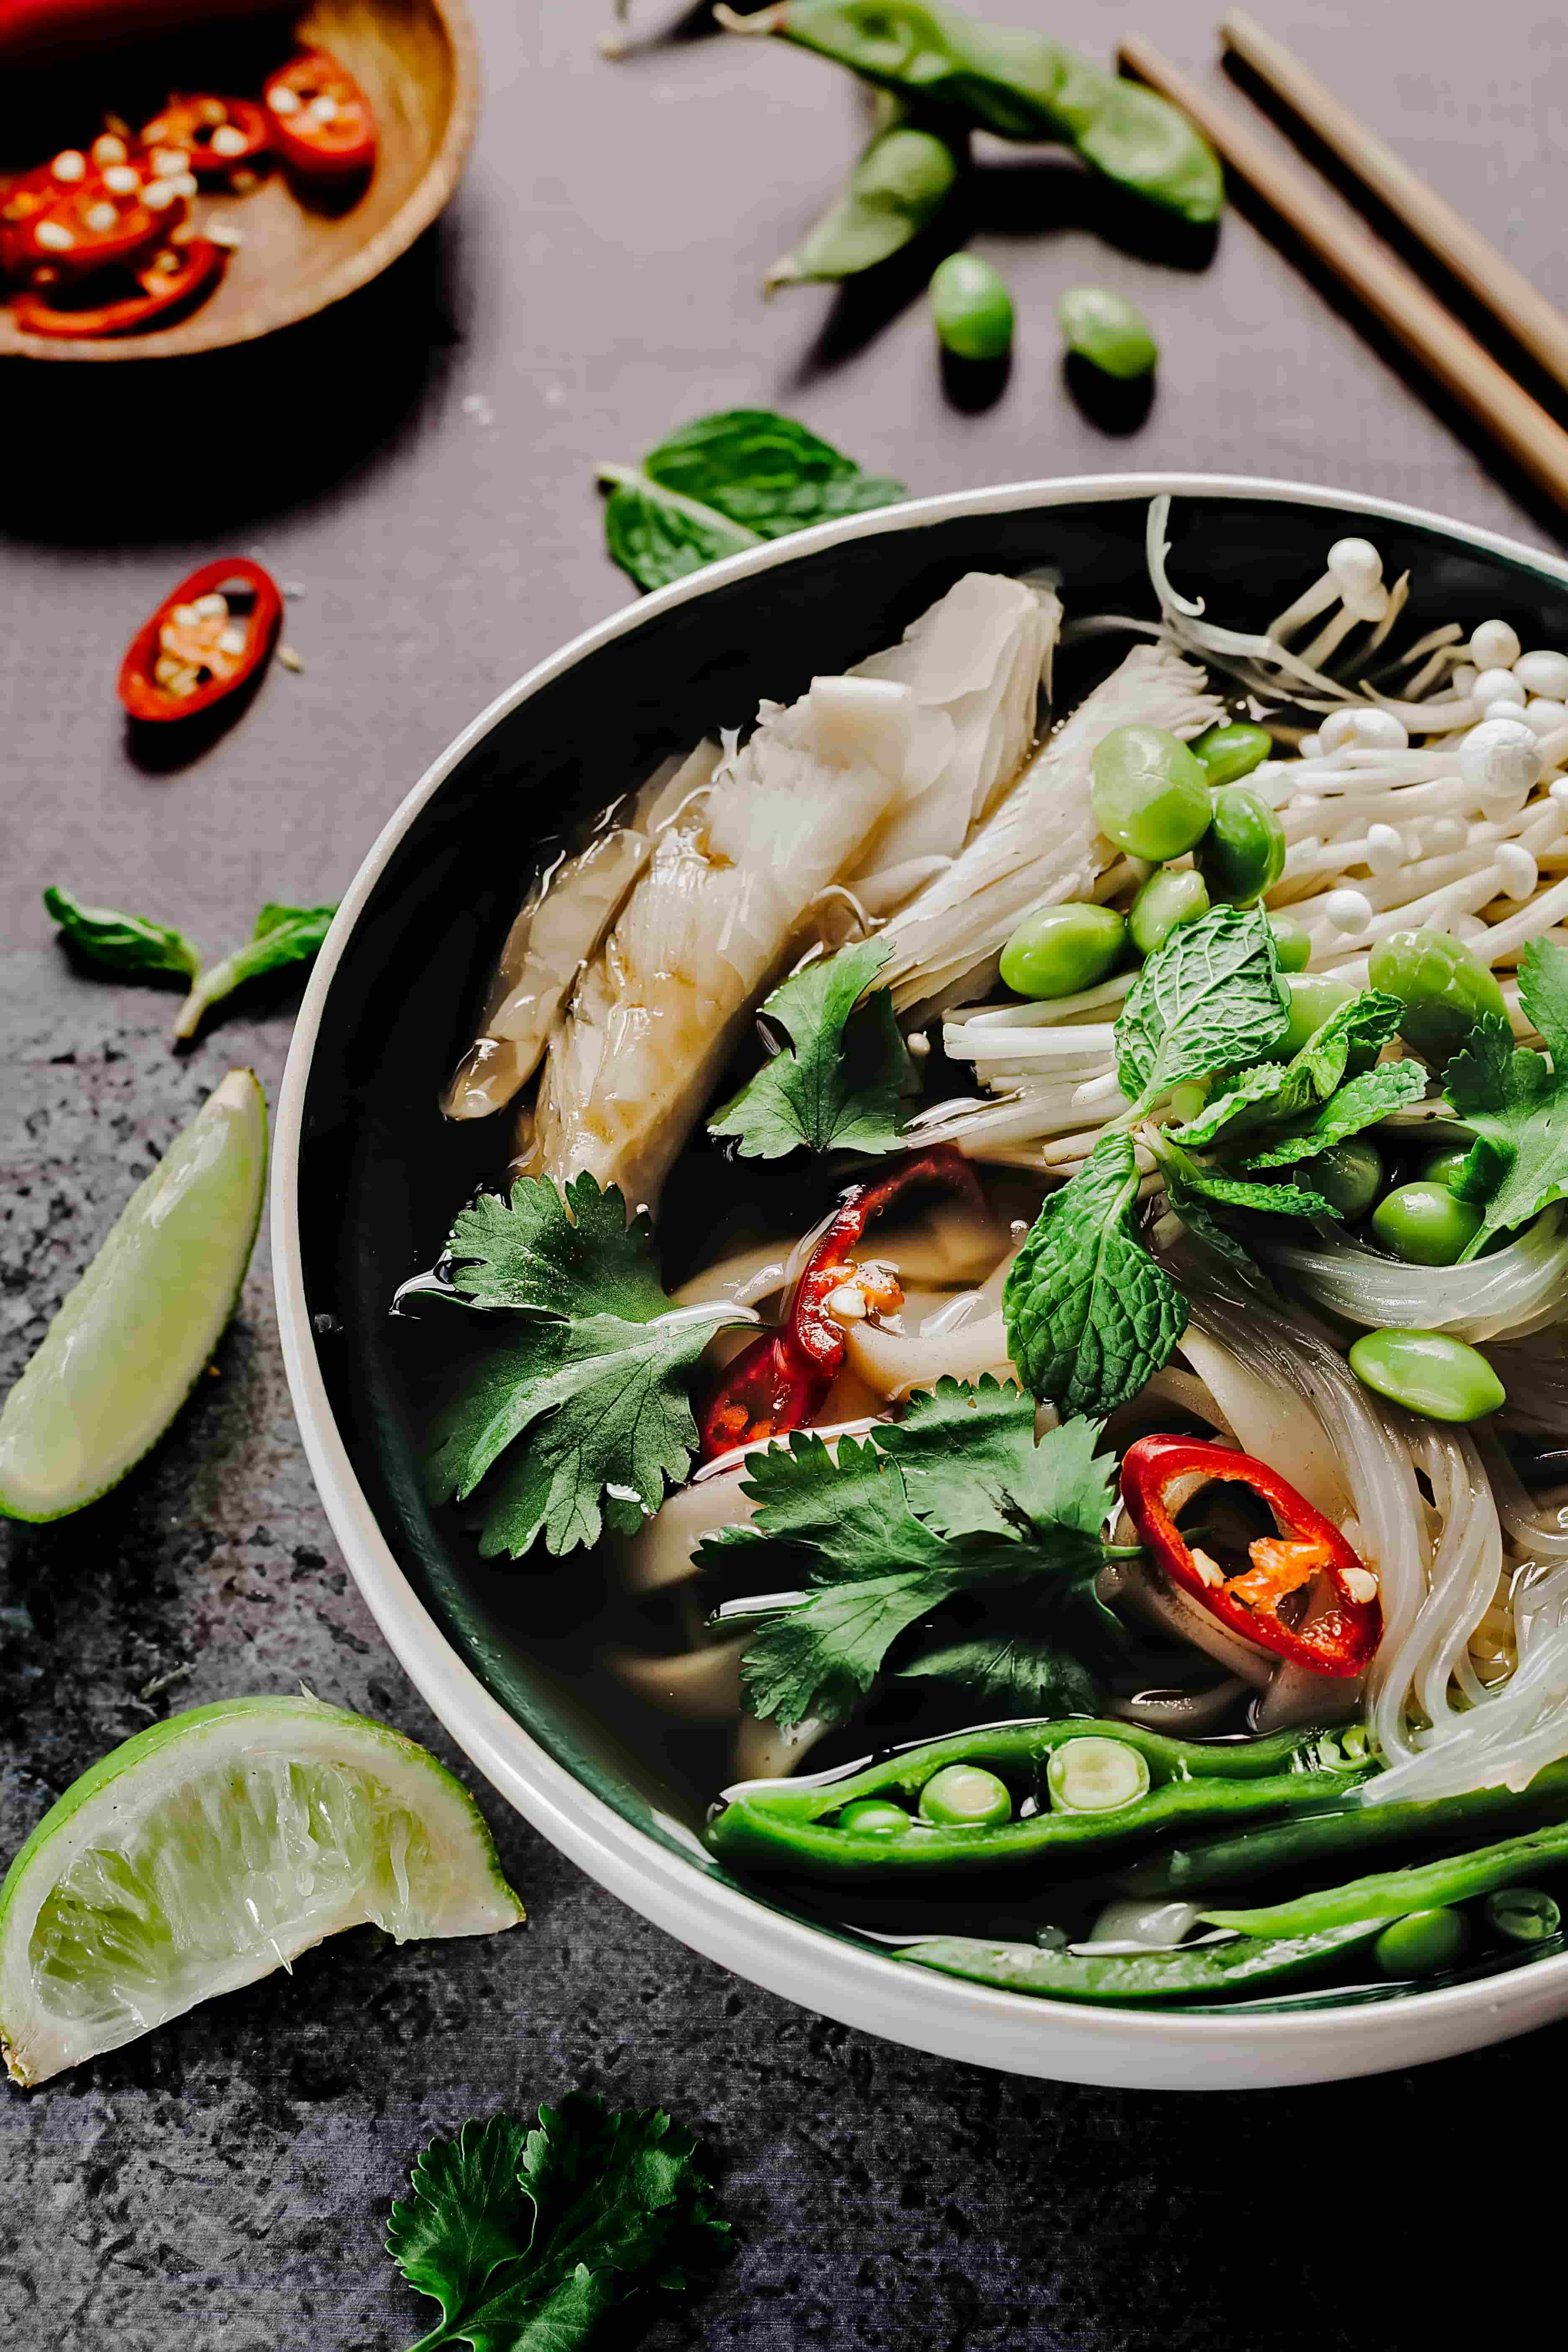 Vietnamese Menu: Spotlight in Pho